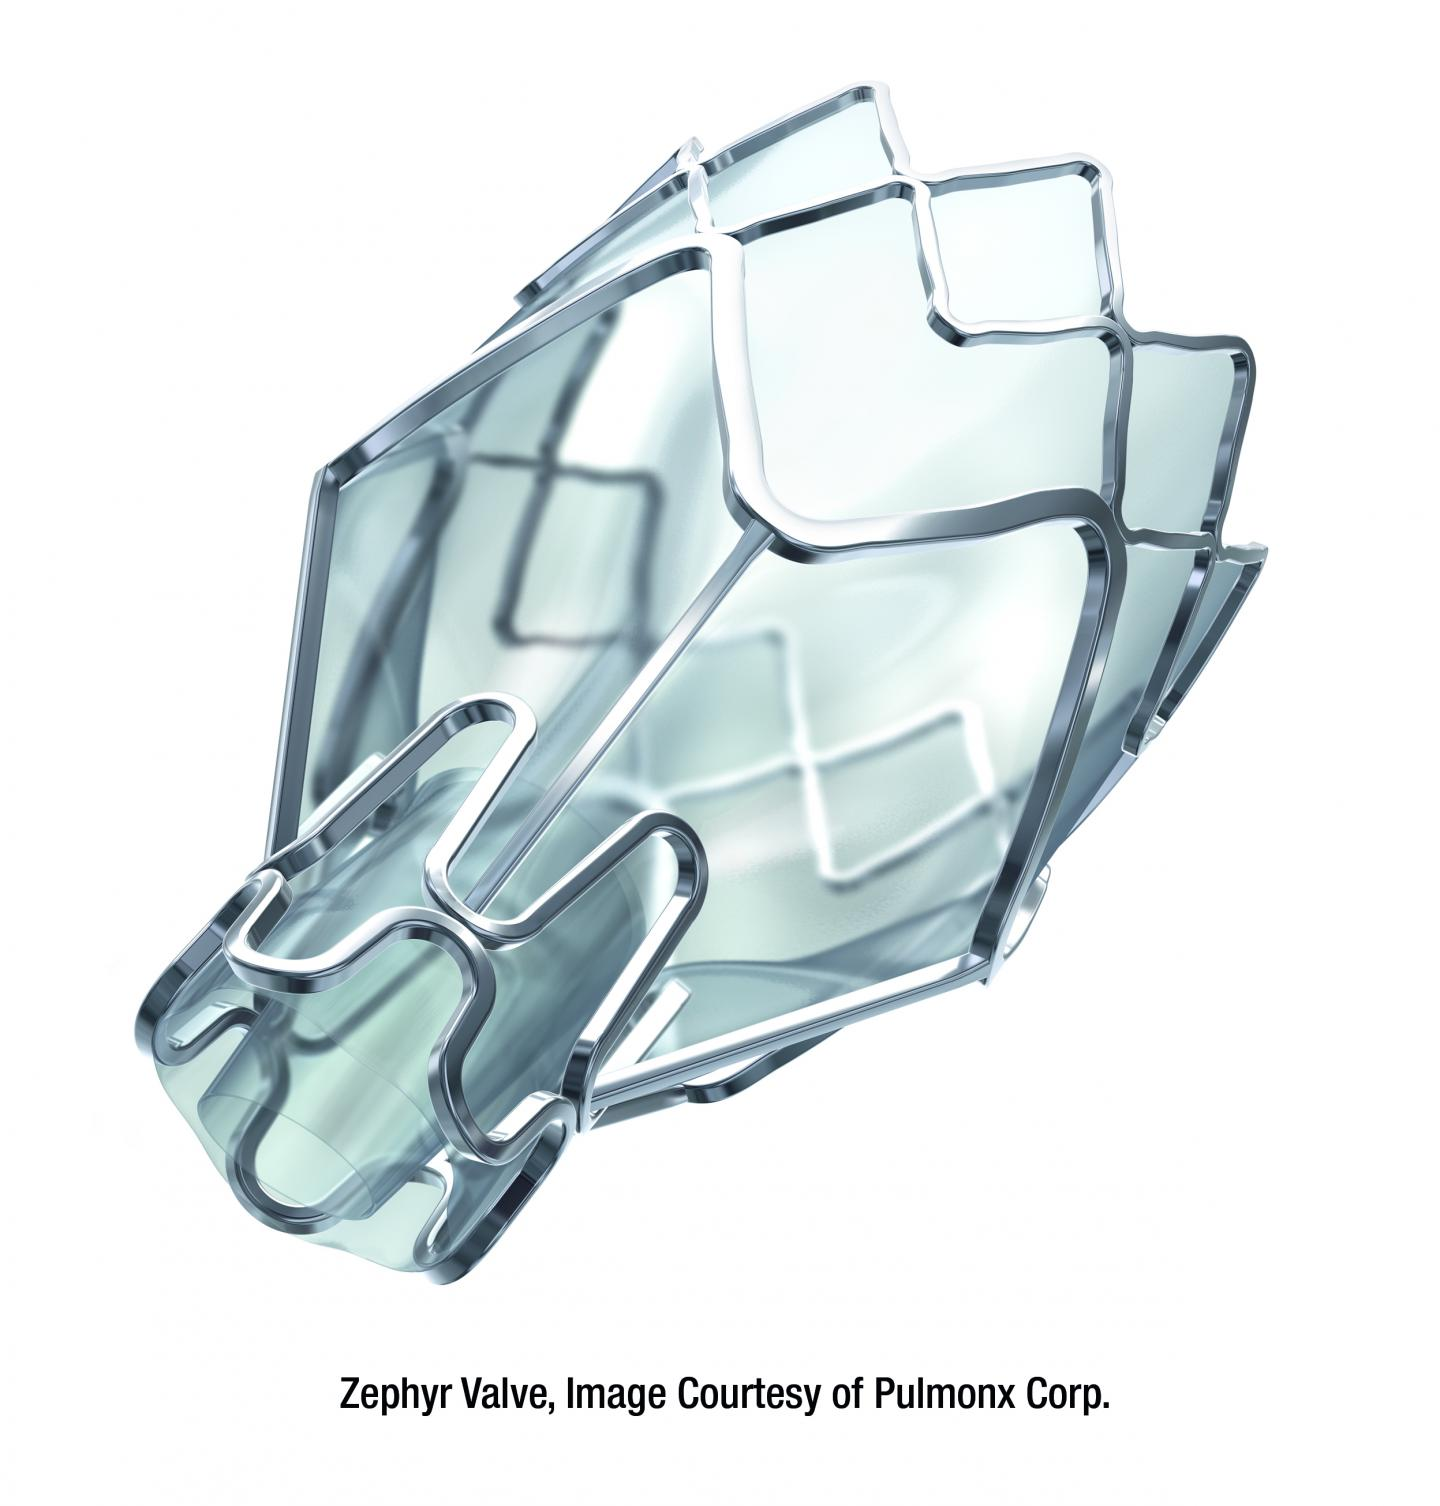 Zephyr Valve